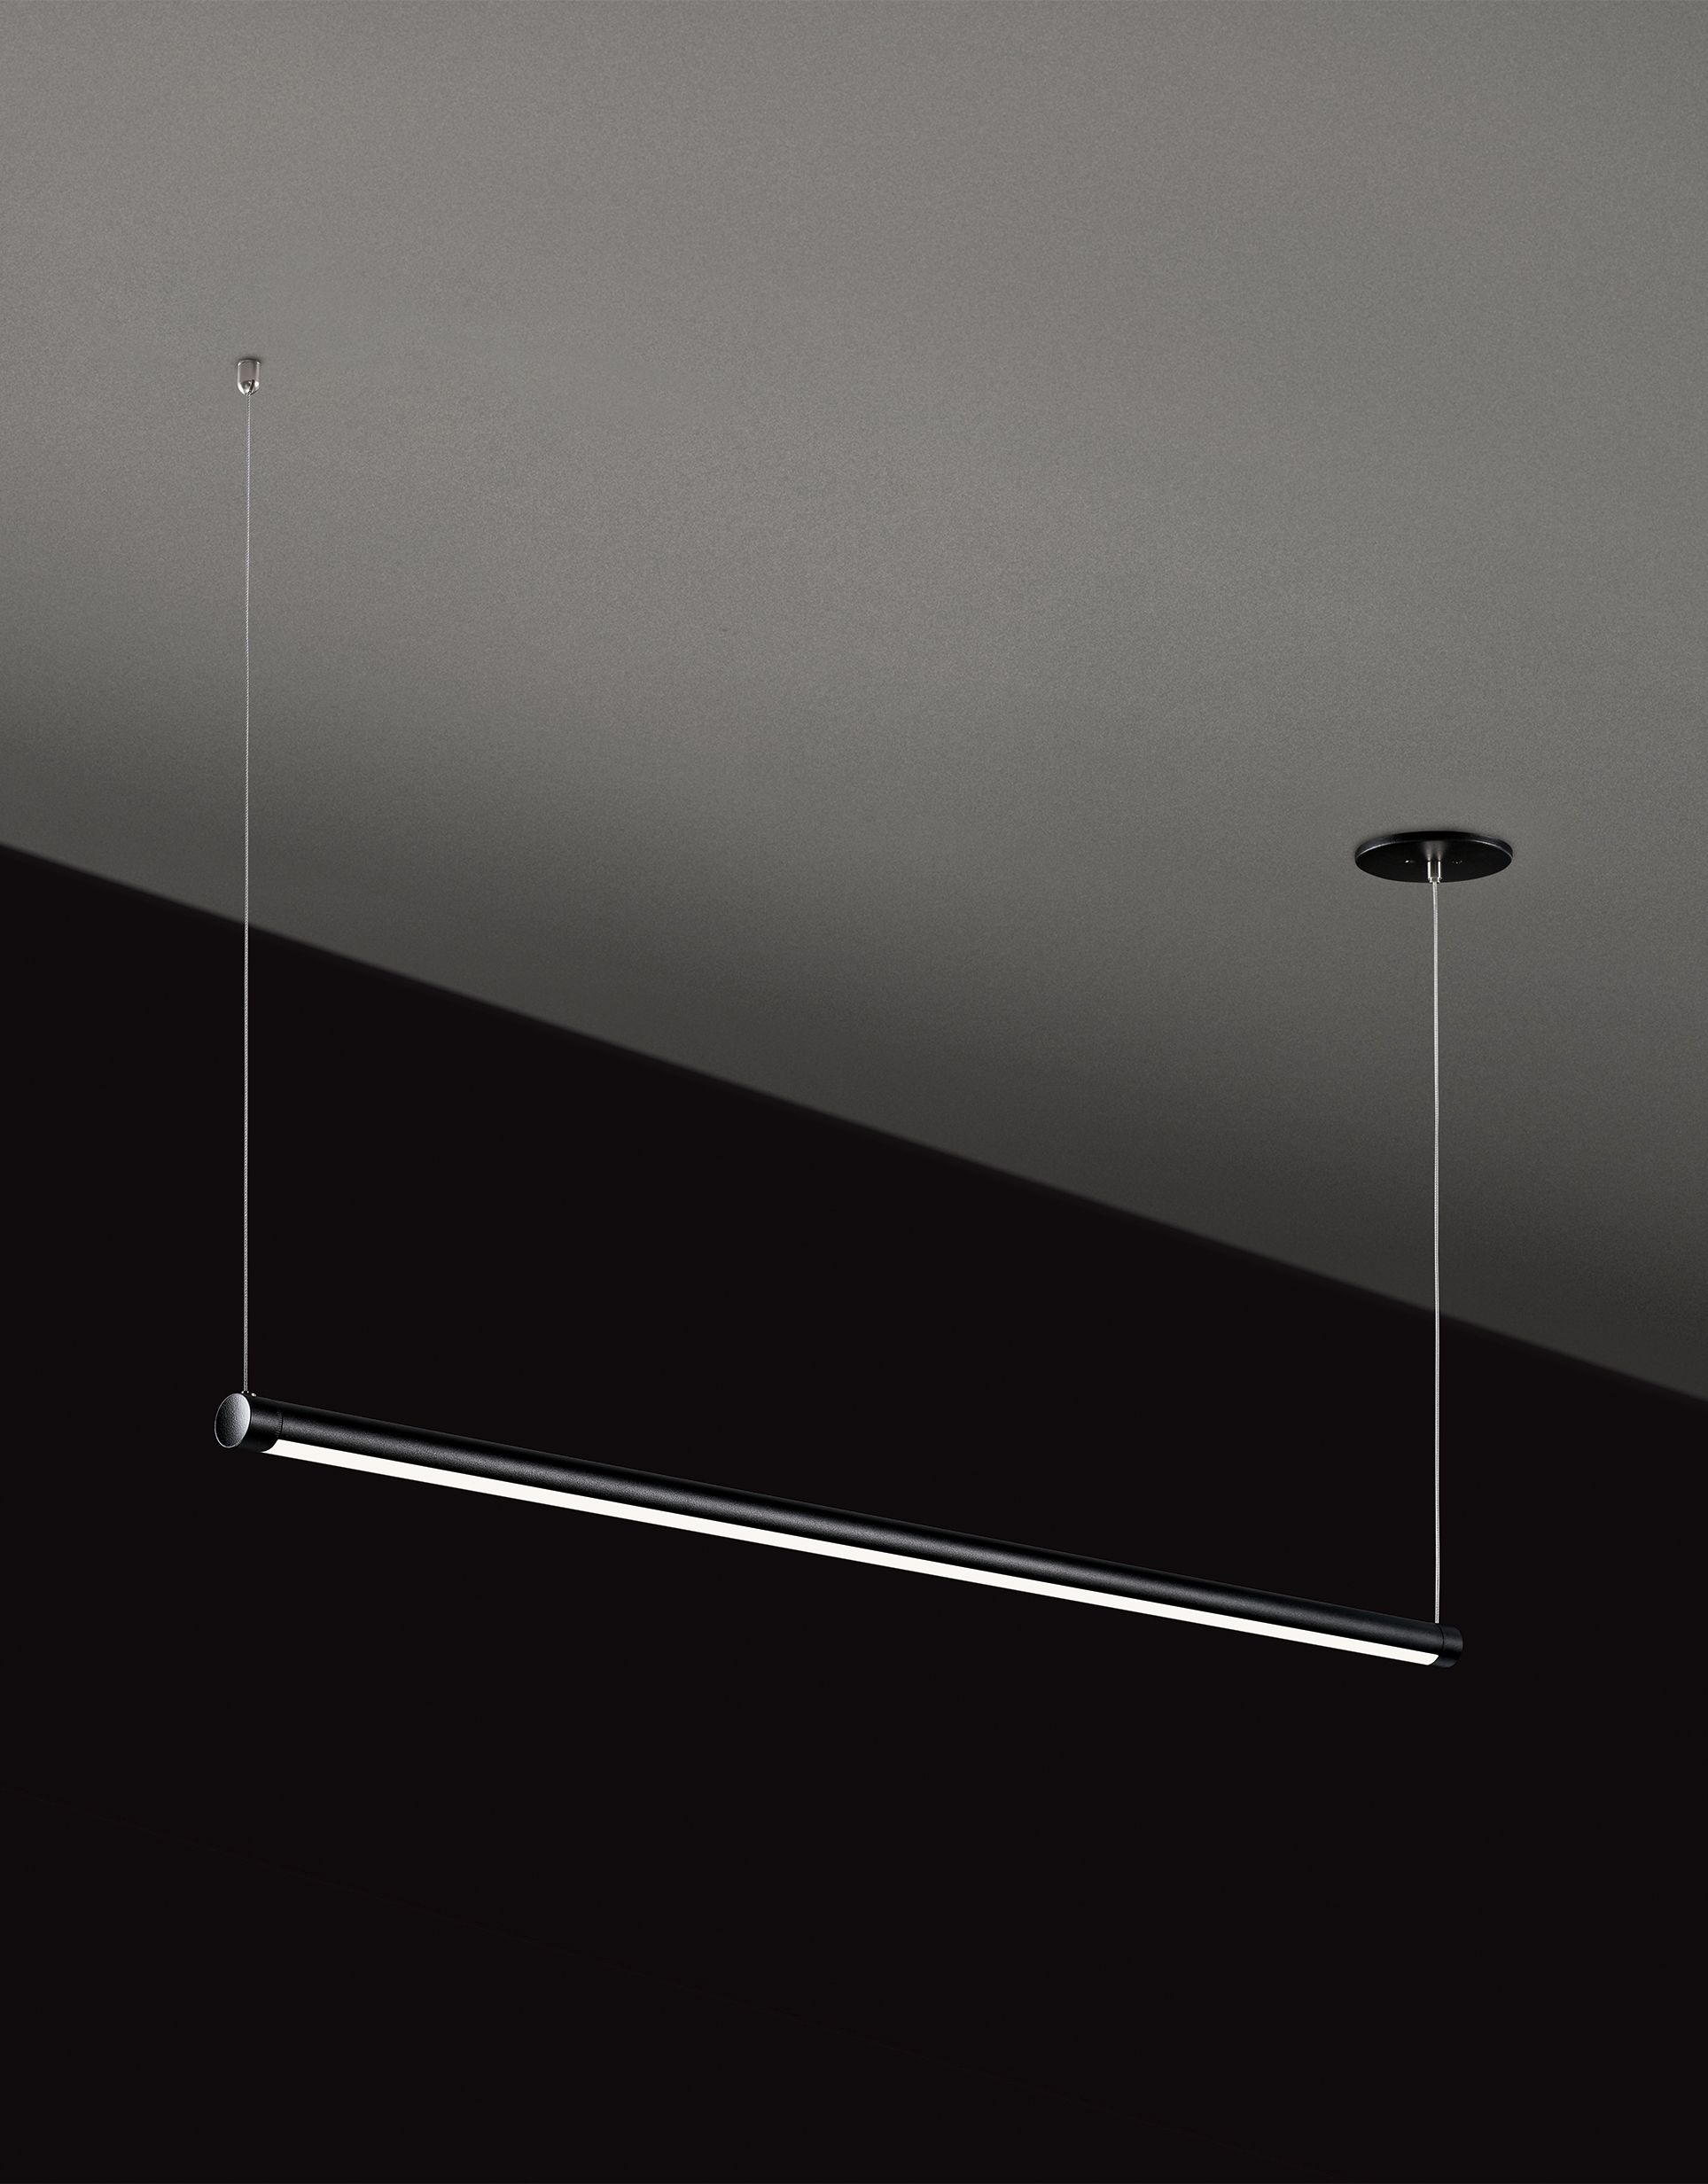 Dash Pendant - OCL Architectural Lighting | Lighting ...